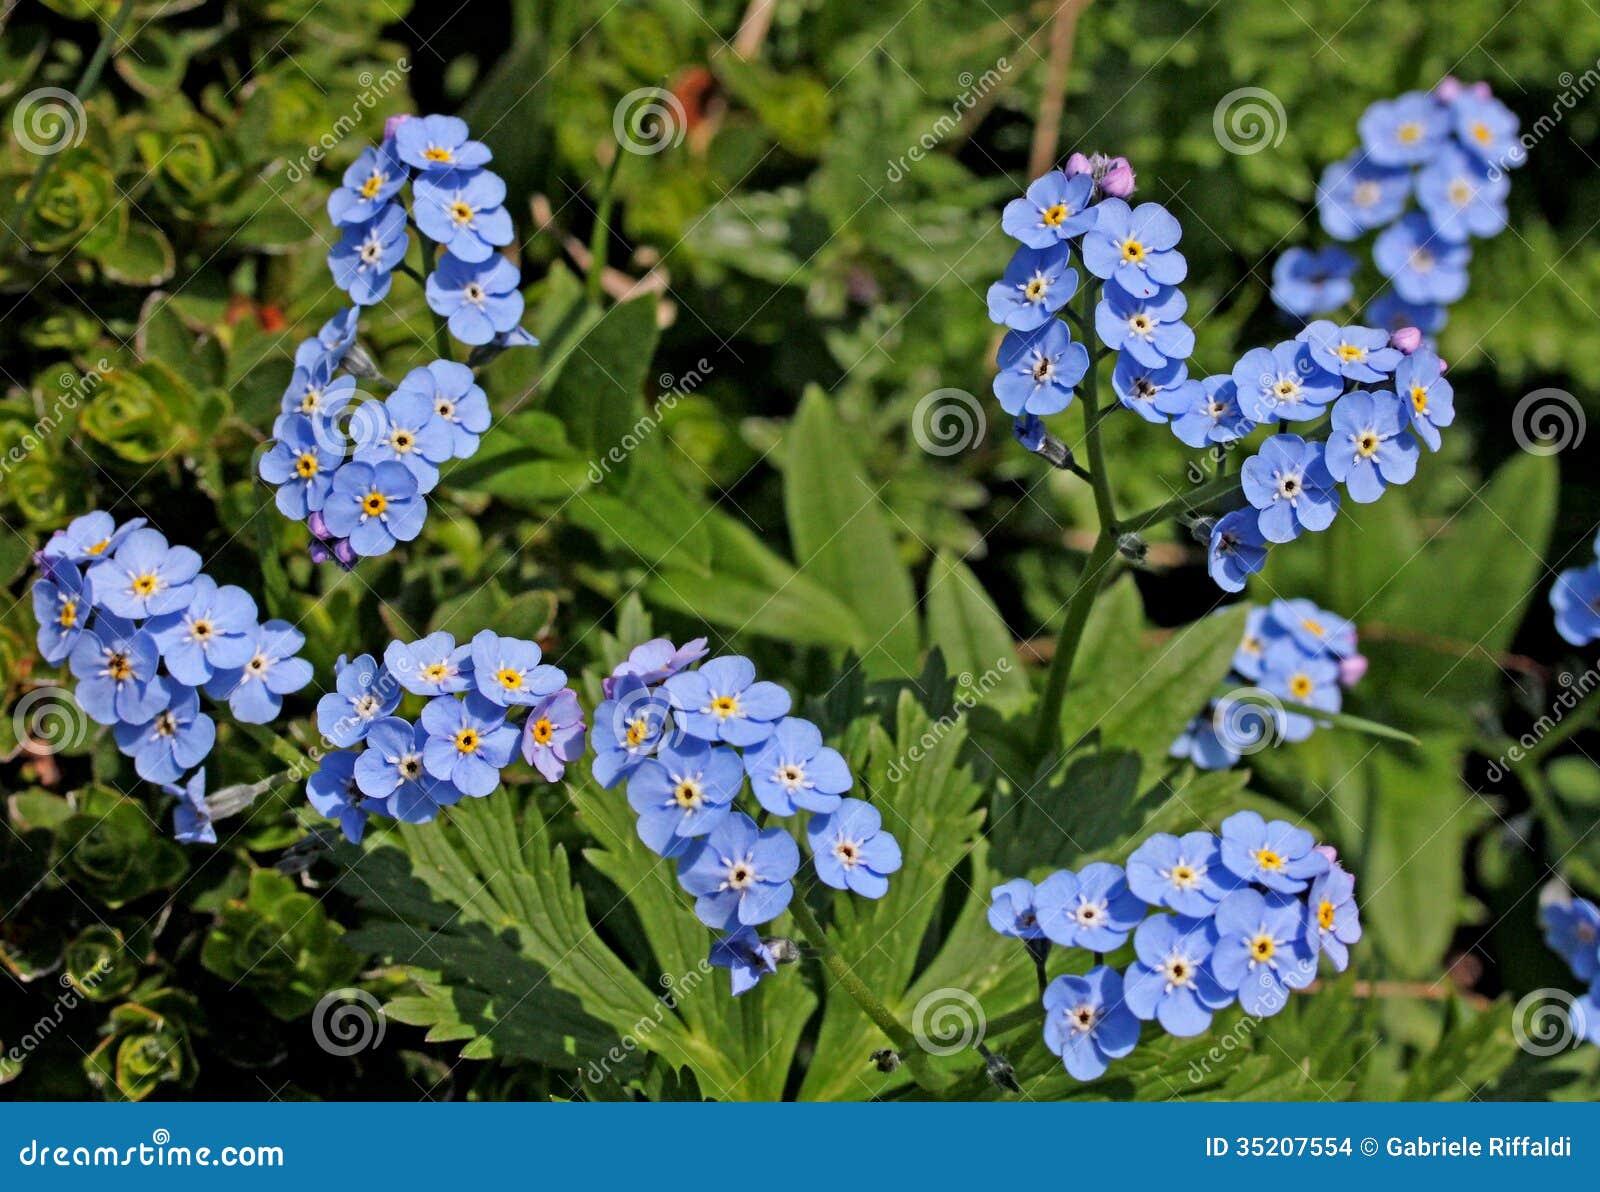 Forget-me-not Flower Myosotis Alpestris Growing Wild In Woodland ...